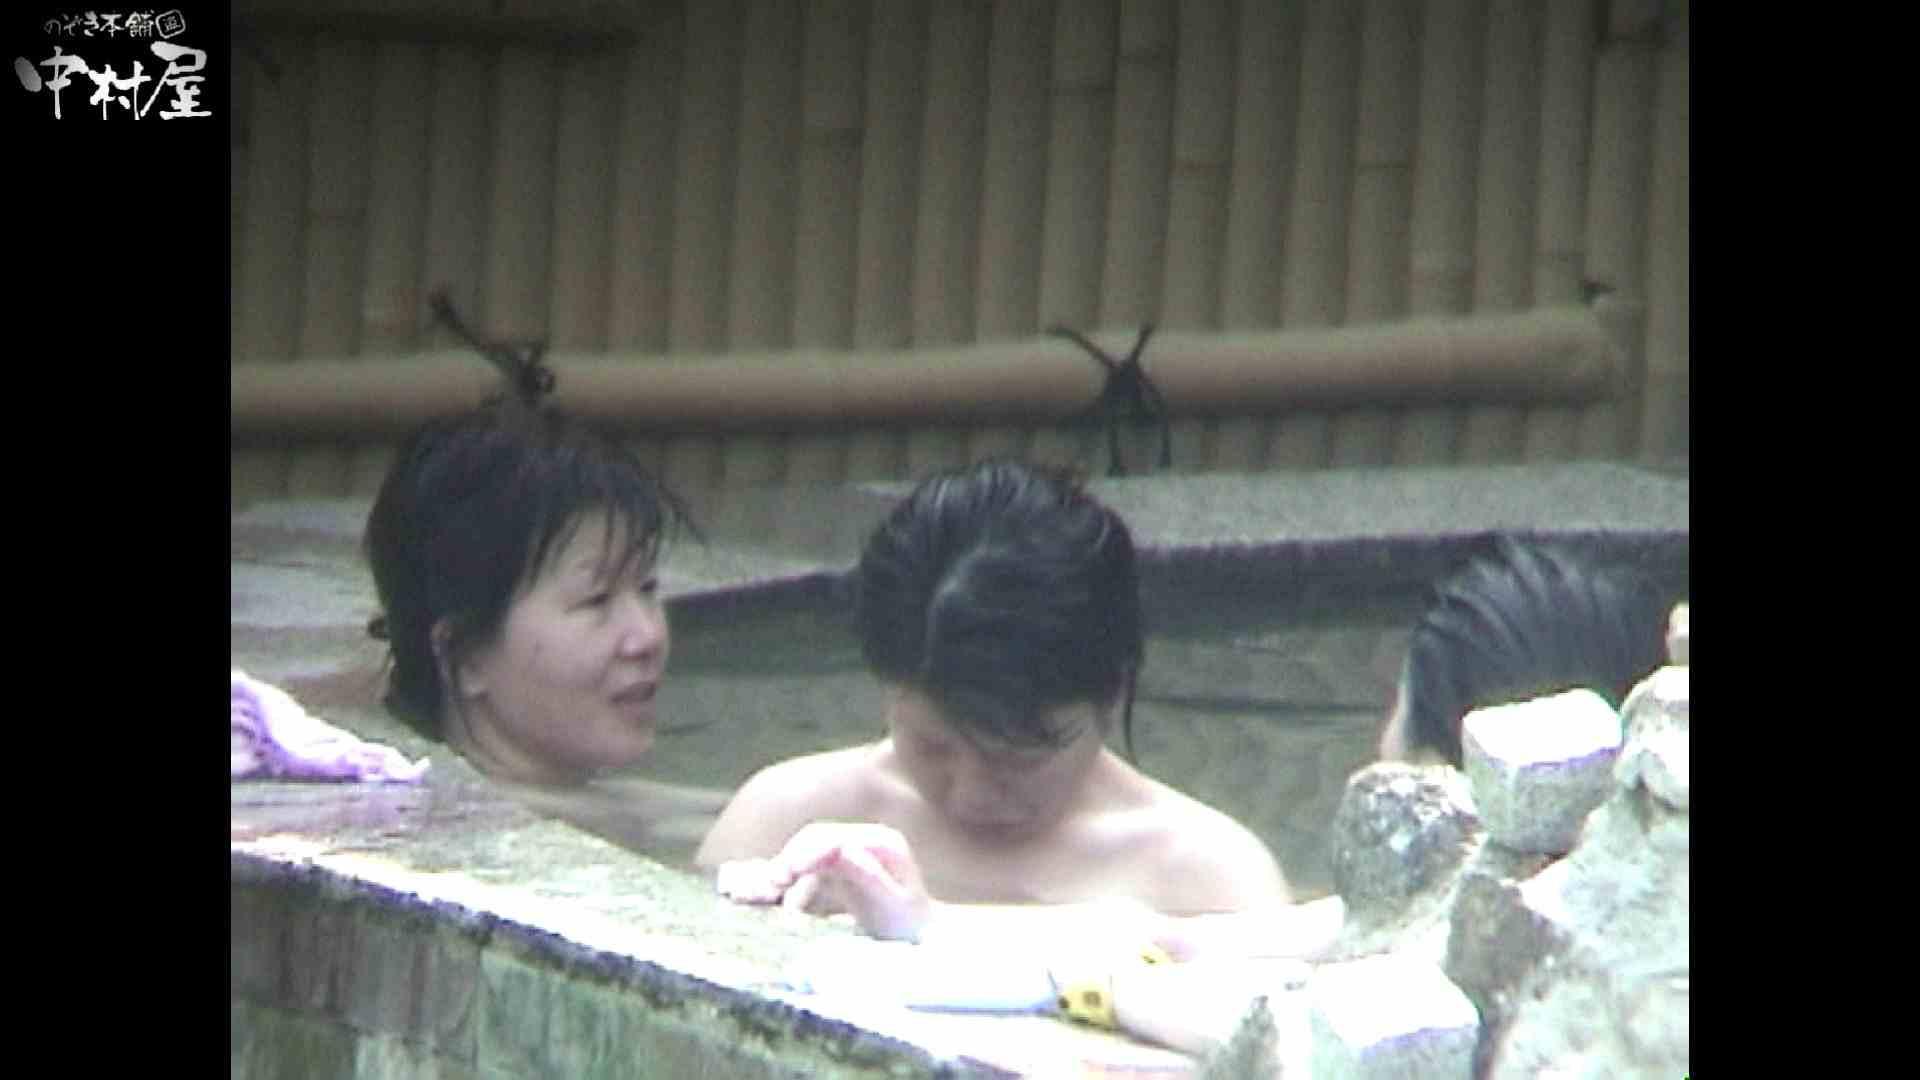 Aquaな露天風呂Vol.936 OLセックス 覗きぱこり動画紹介 75画像 50